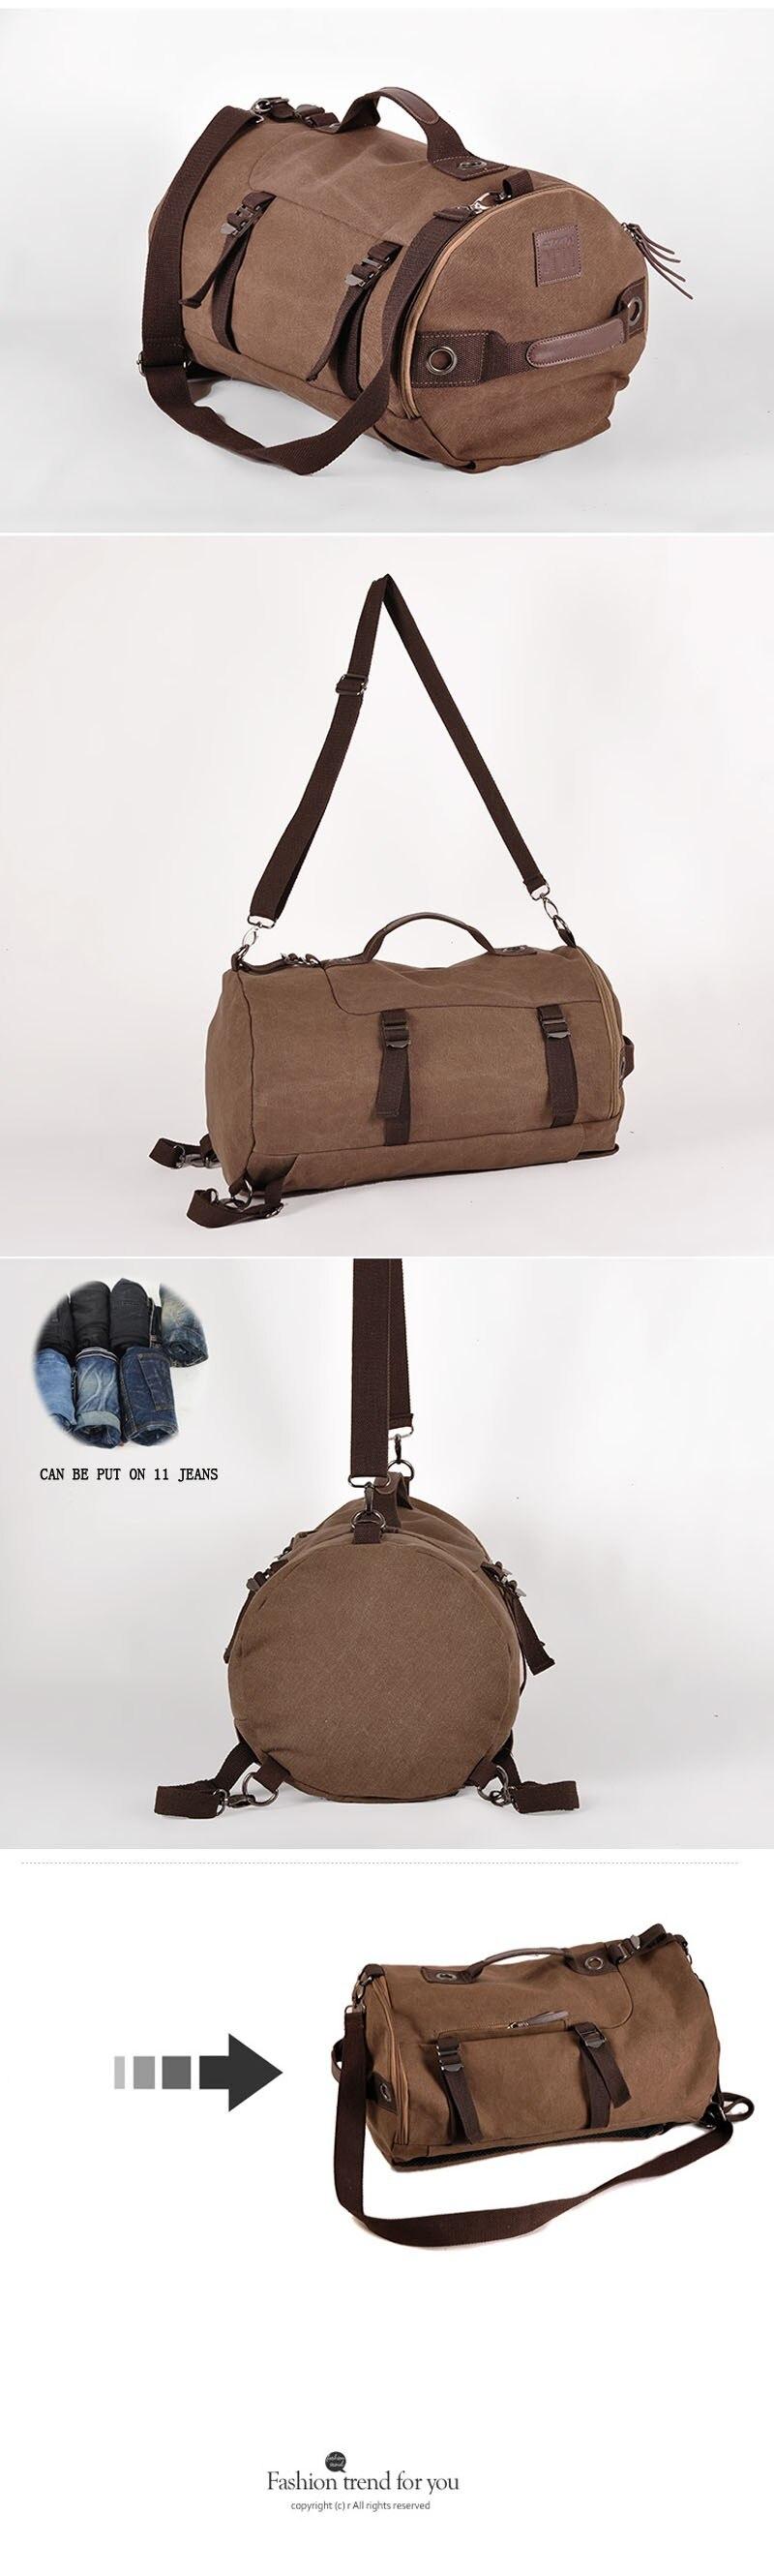 Men's Multi-Functional Backpack Vintage Shoulder Bag High Quality Canvas Male Bagpack Rucksack Travel Luggage for Weekend 34